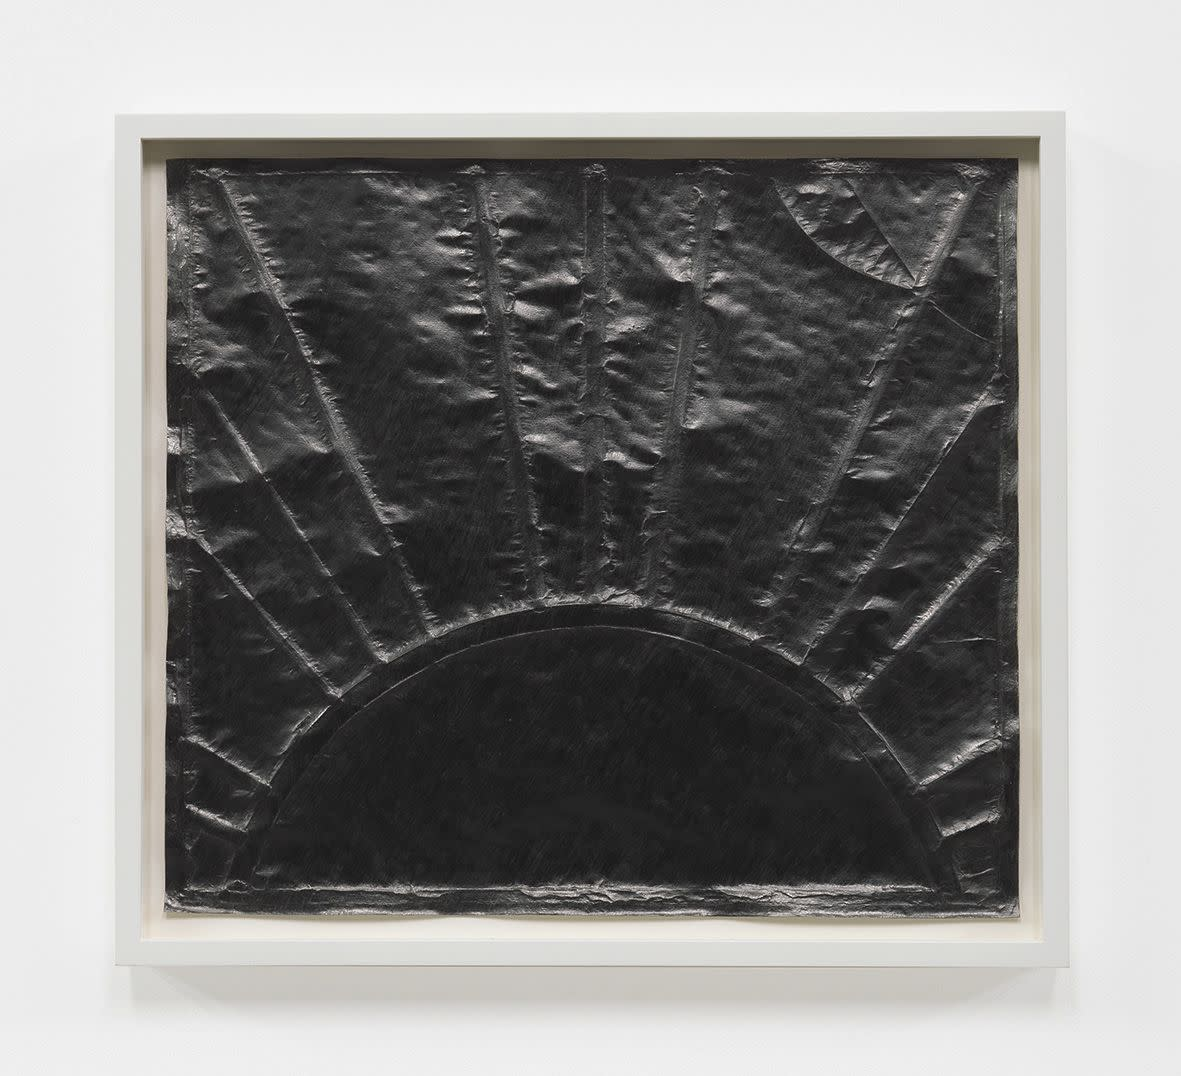 "<span class=""link fancybox-details-link""><a href=""/exhibitions/133/works/artworks9406/"">View Detail Page</a></span><div class=""artist""><strong>Anna Barriball</strong></div><div class=""title""><em>Sunrise/Sunset XII</em>, 2012</div><div class=""medium"">pencil on paper</div><div class=""dimensions"">framed: 43,5 x 48,6 cm</div>"